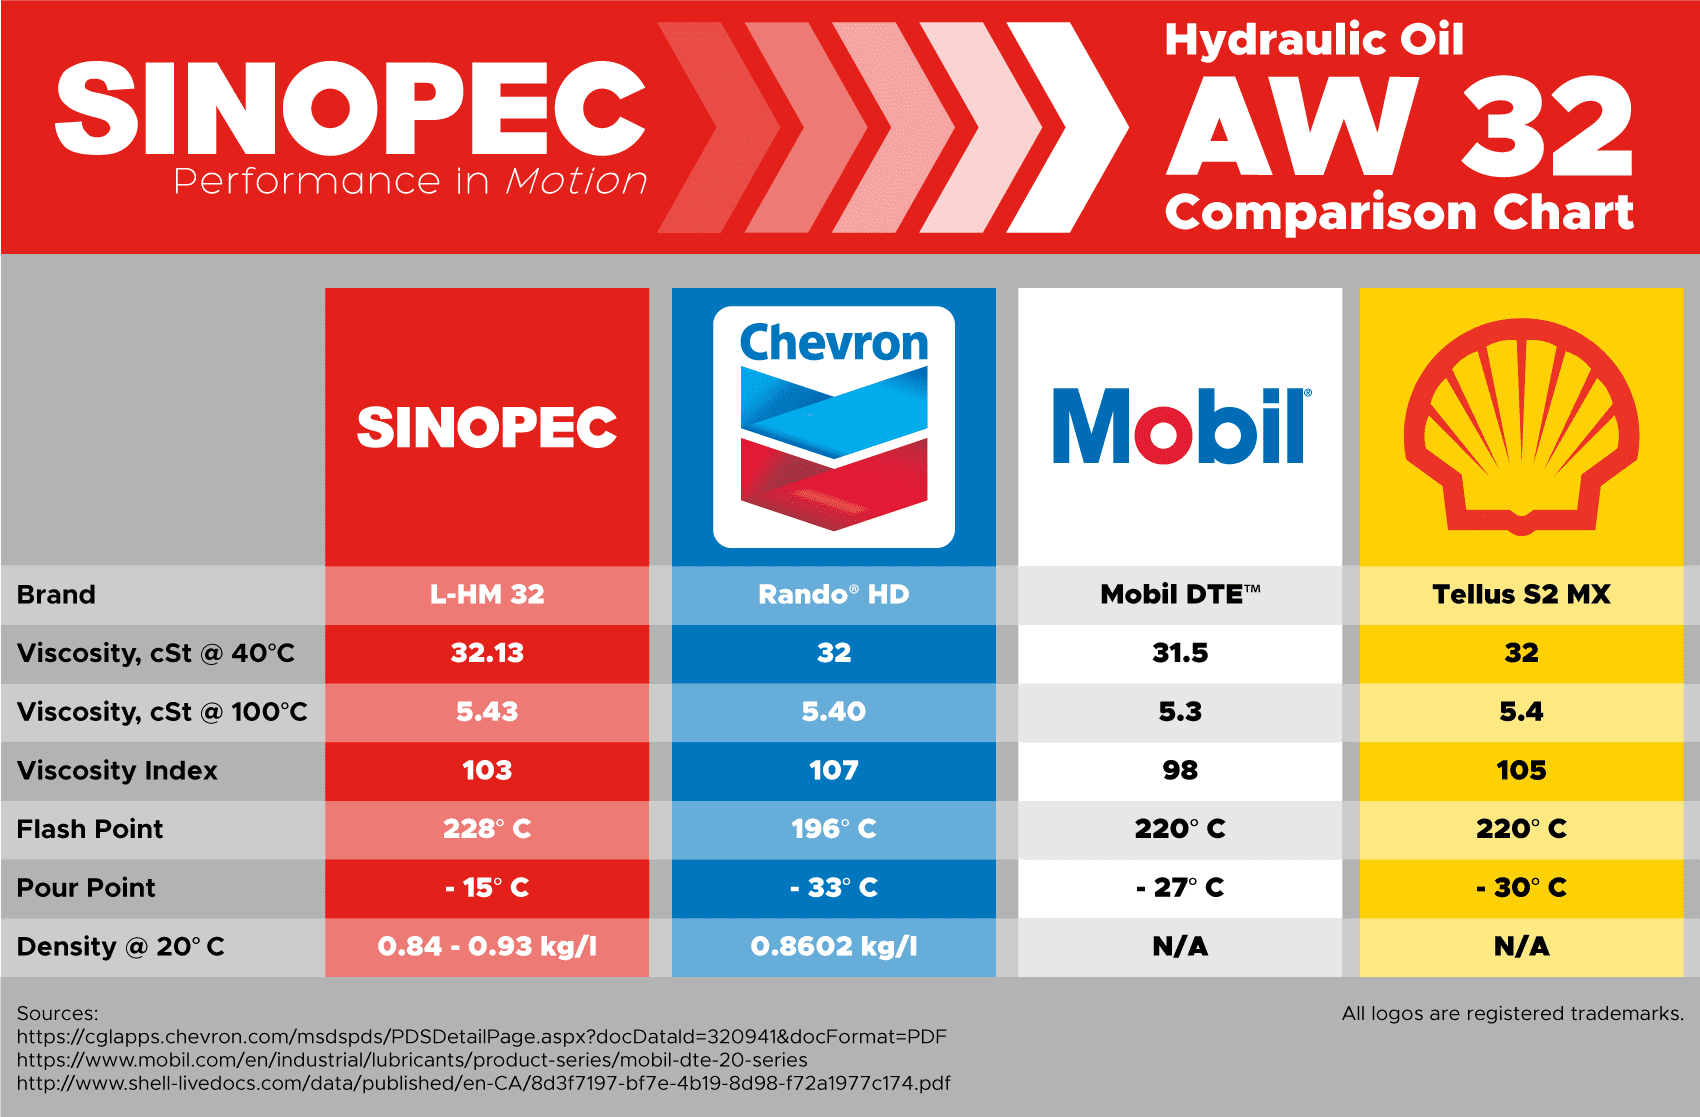 AW 32 Hydraulic Oil Fluid (ISO VG 32, SAE 10W), 5 Gallon Pail